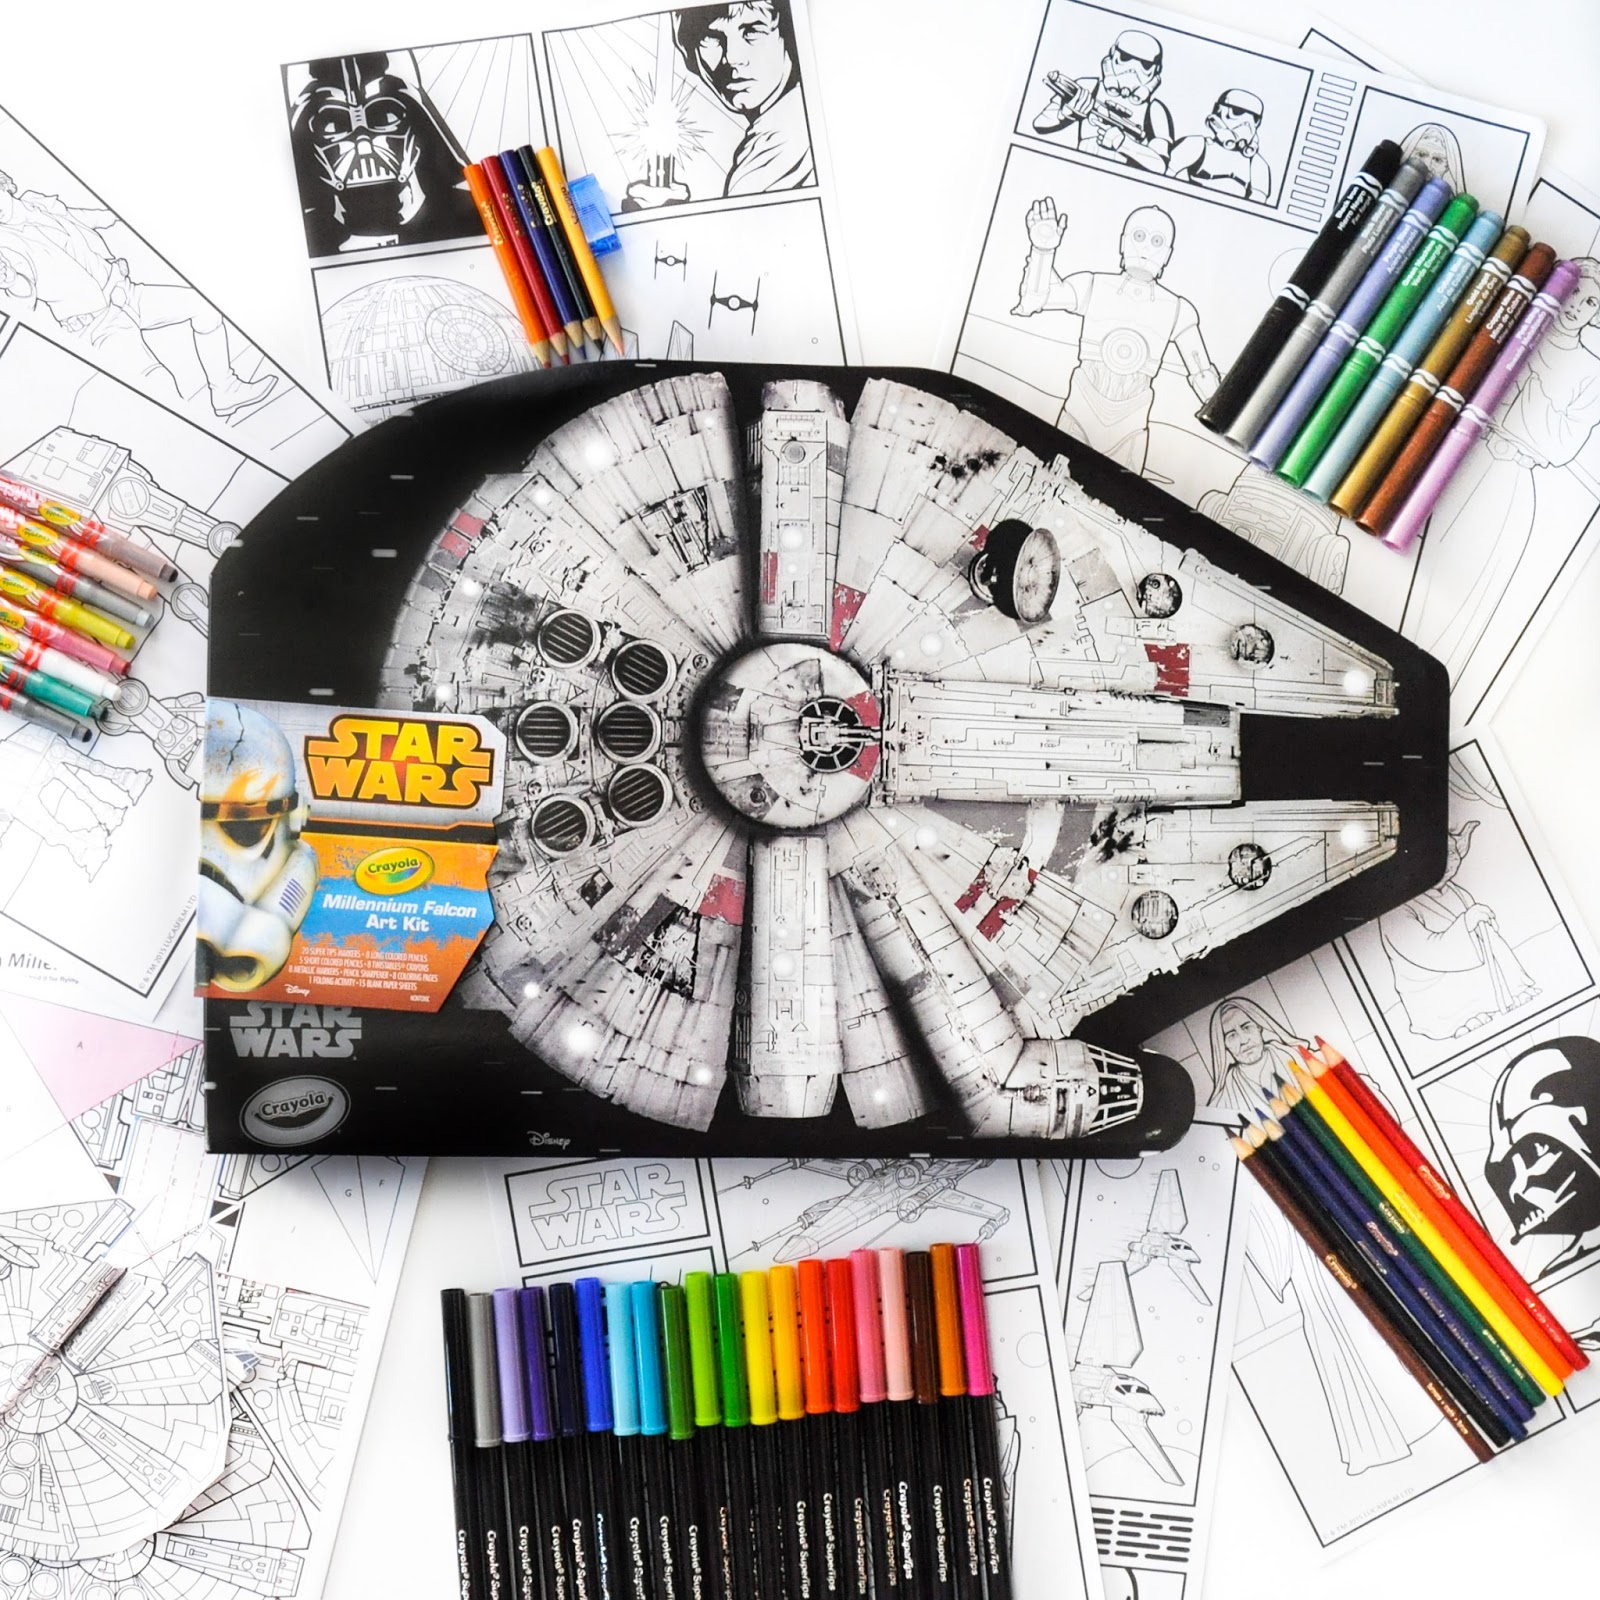 Crayola Star Wars Millennium Falcon Art Kit Whats Inside The Kit